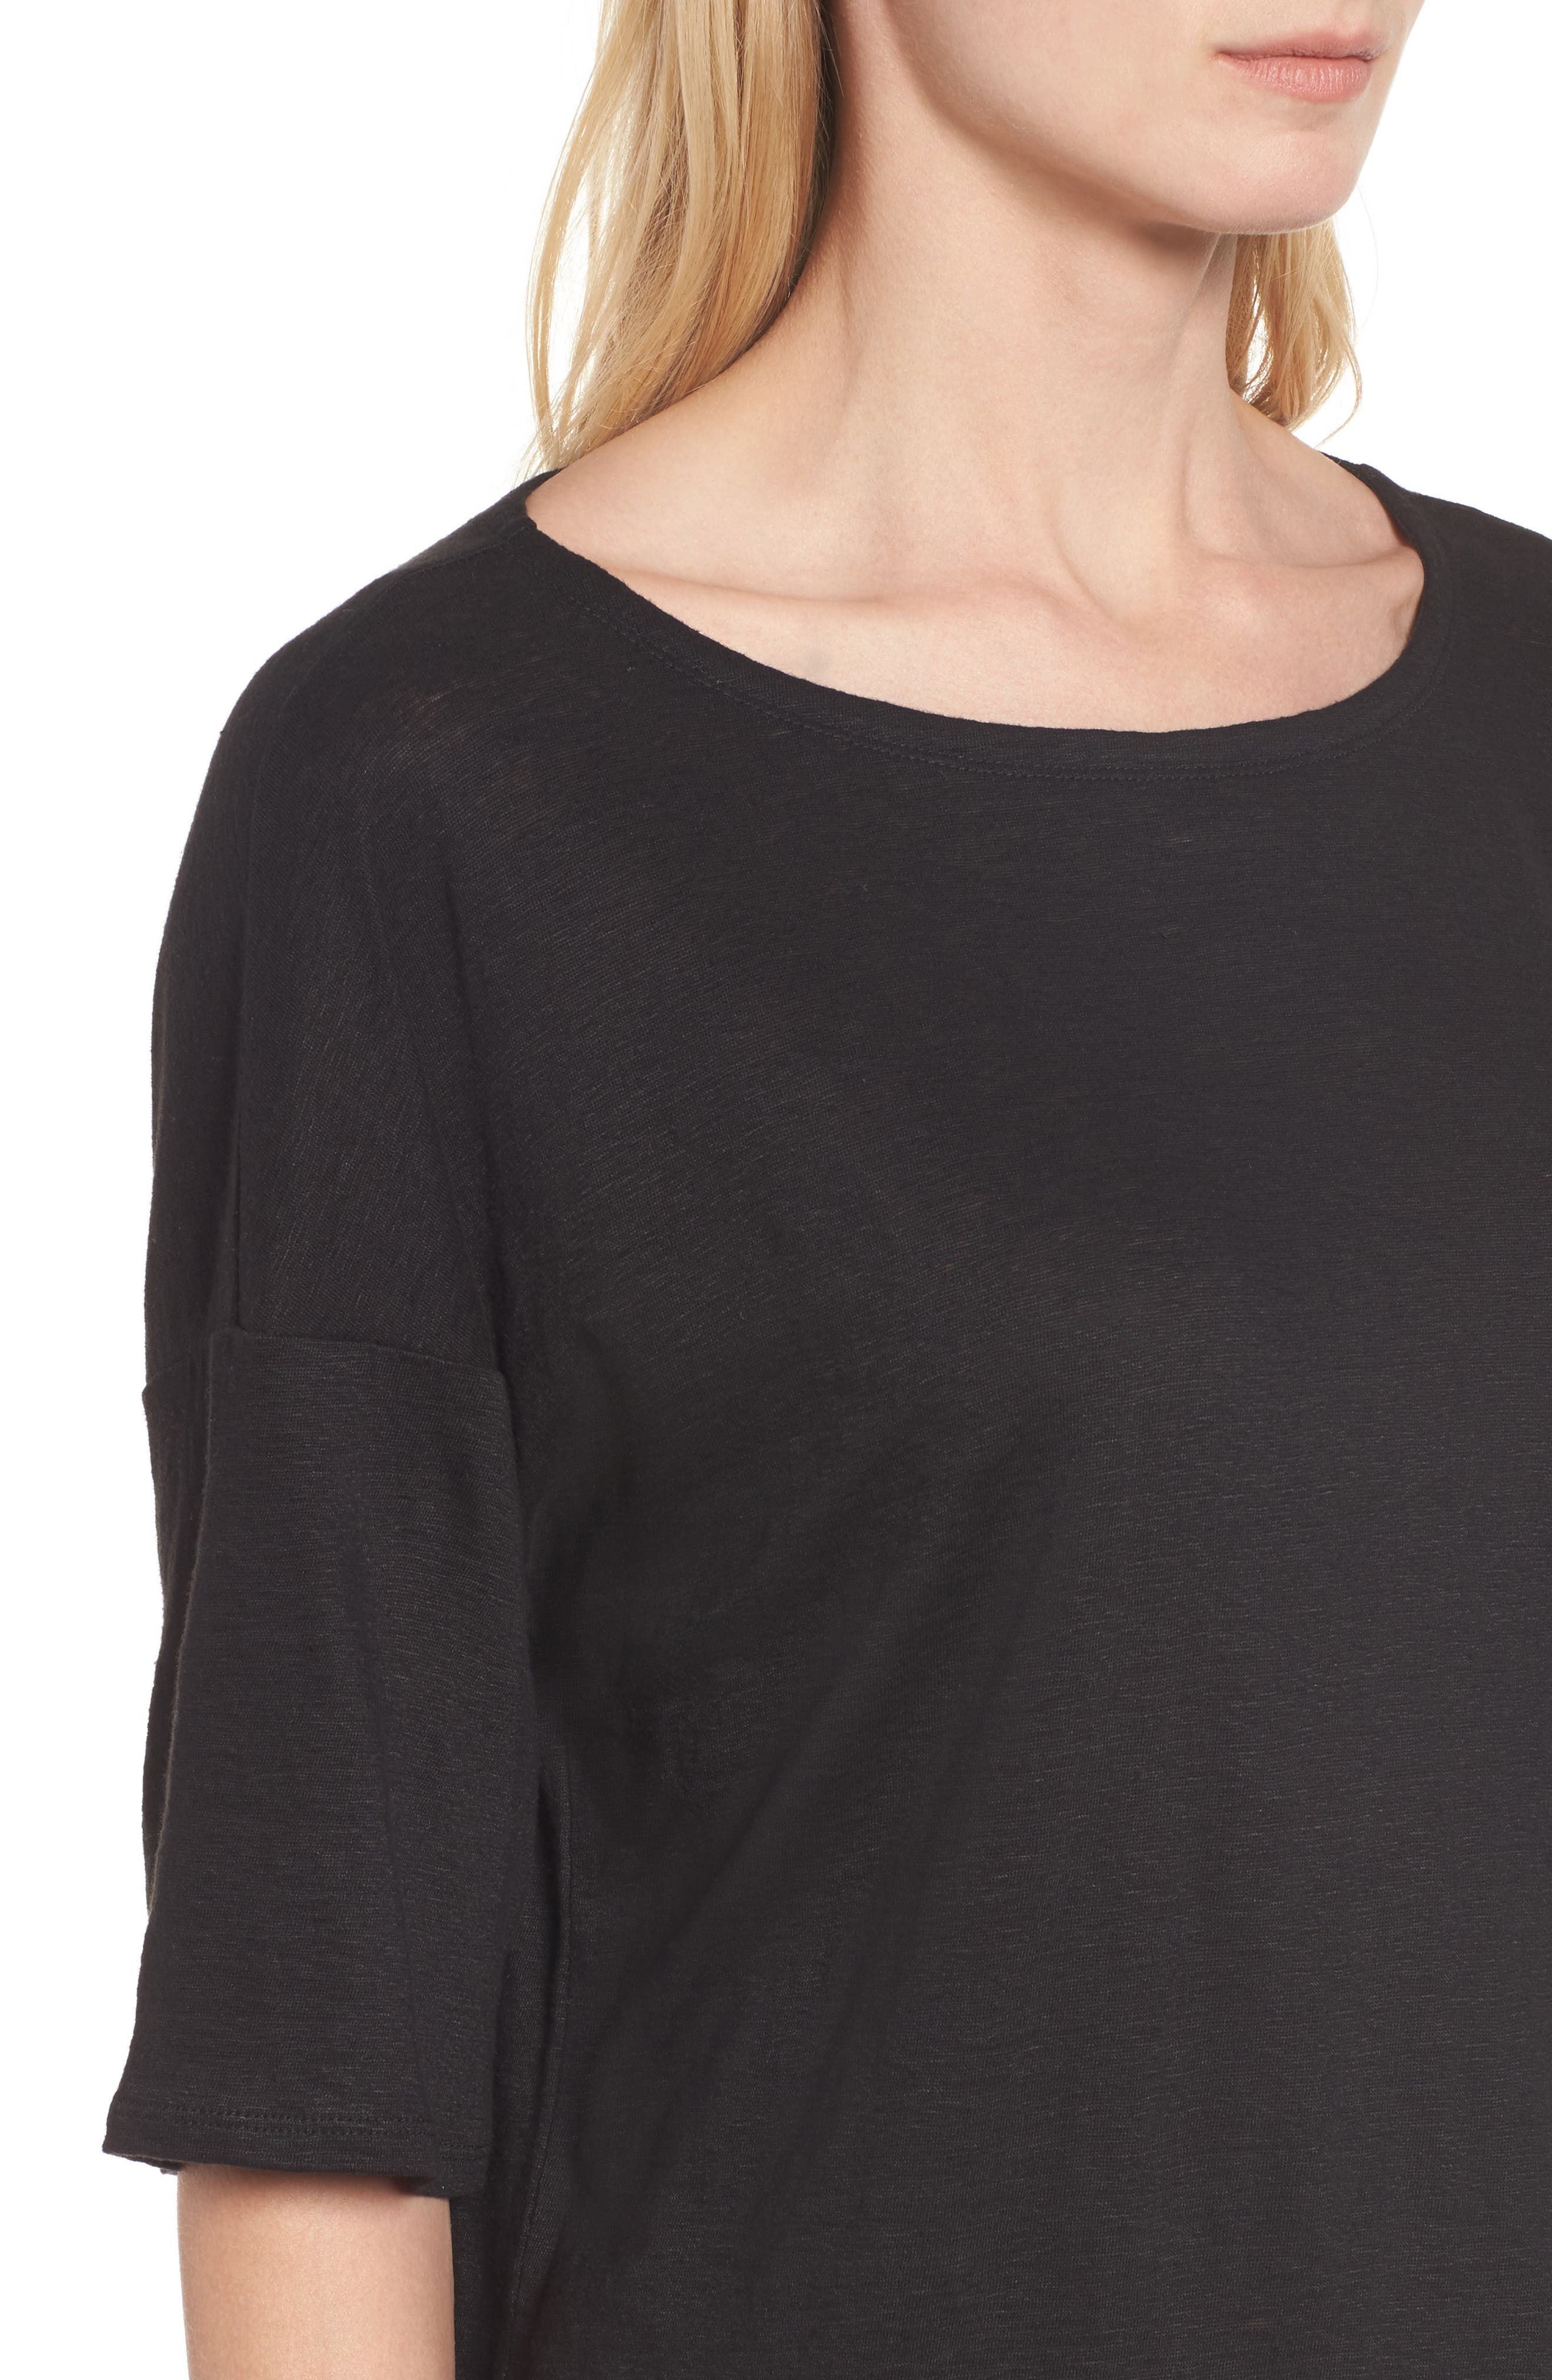 Alternate Image 4  - Eileen Fisher Organic Linen Jersey Boxy Top